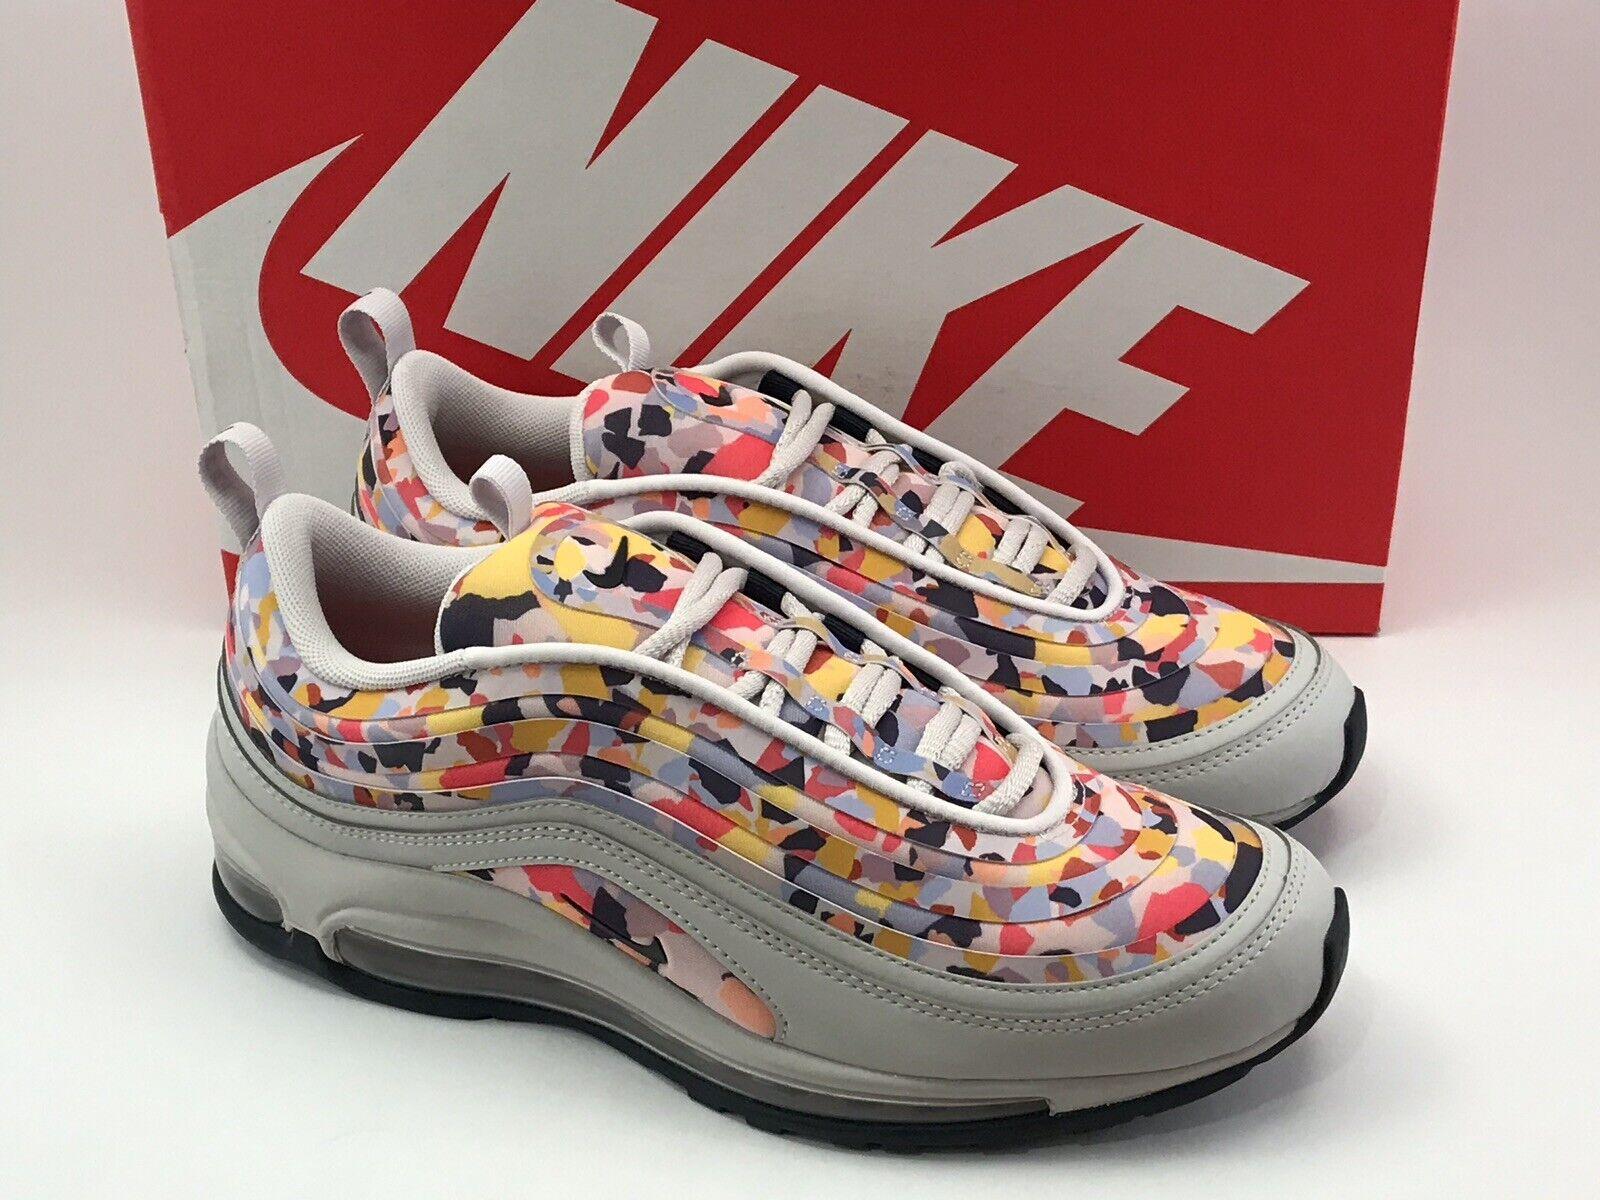 Women's Nike Air Max 97 UL '17 Premium Confetti shoes -Sz 8.5 -AO2325 003 -New